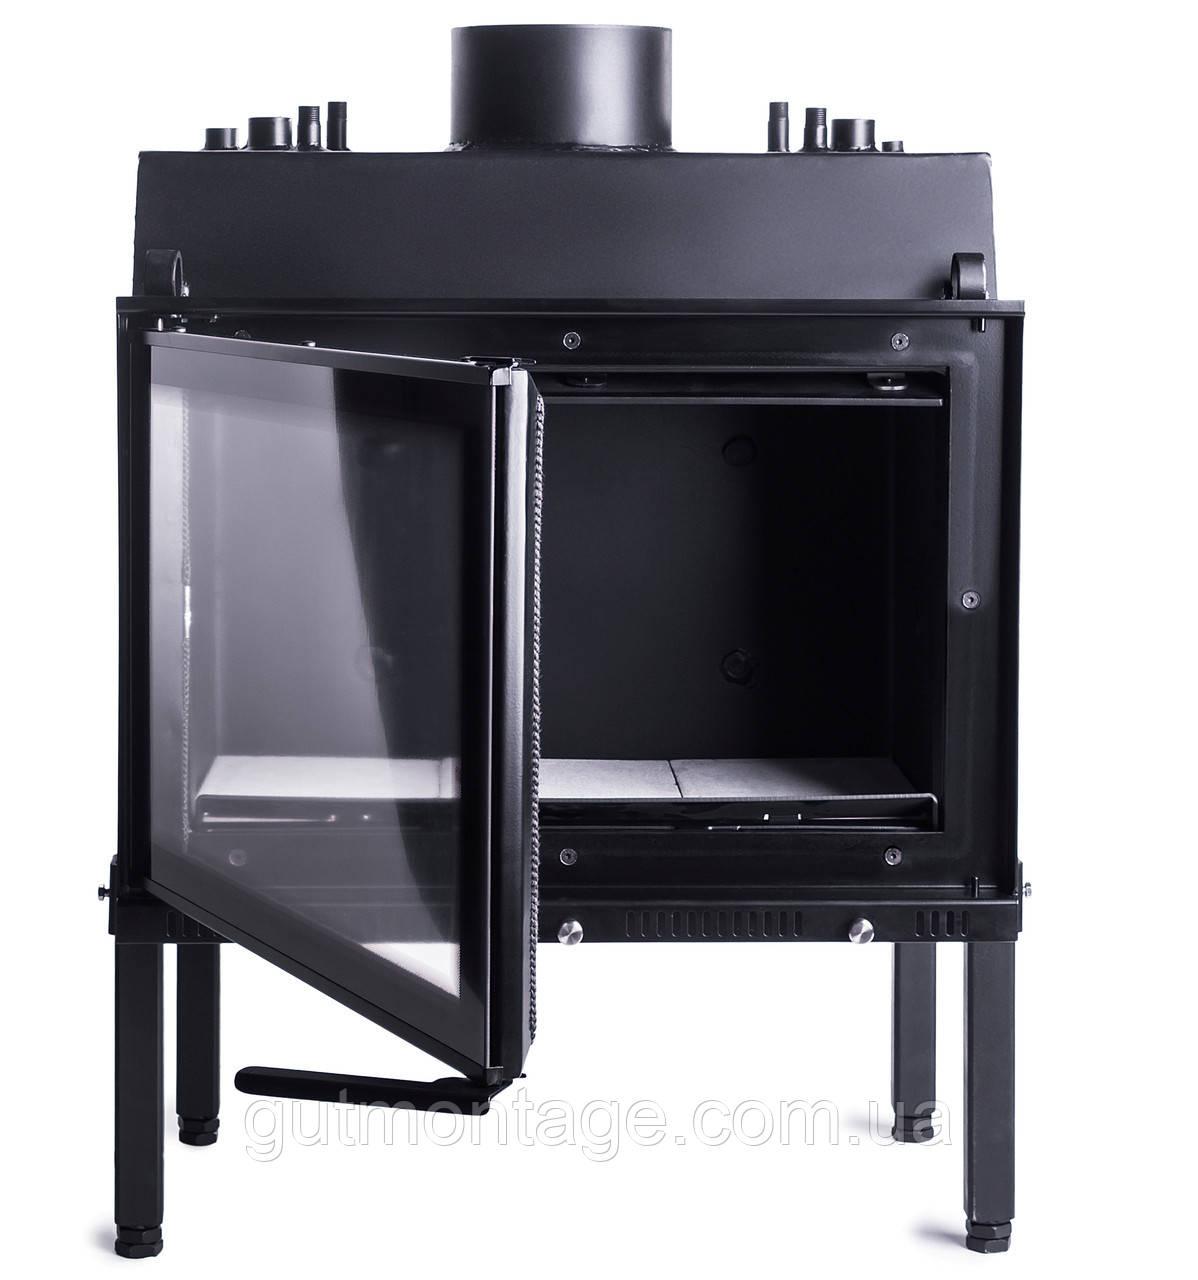 Камин водяной на дровах. Жарко Aqva-750 Lux 25кВт СЗТ. Гарантия 7 лет!